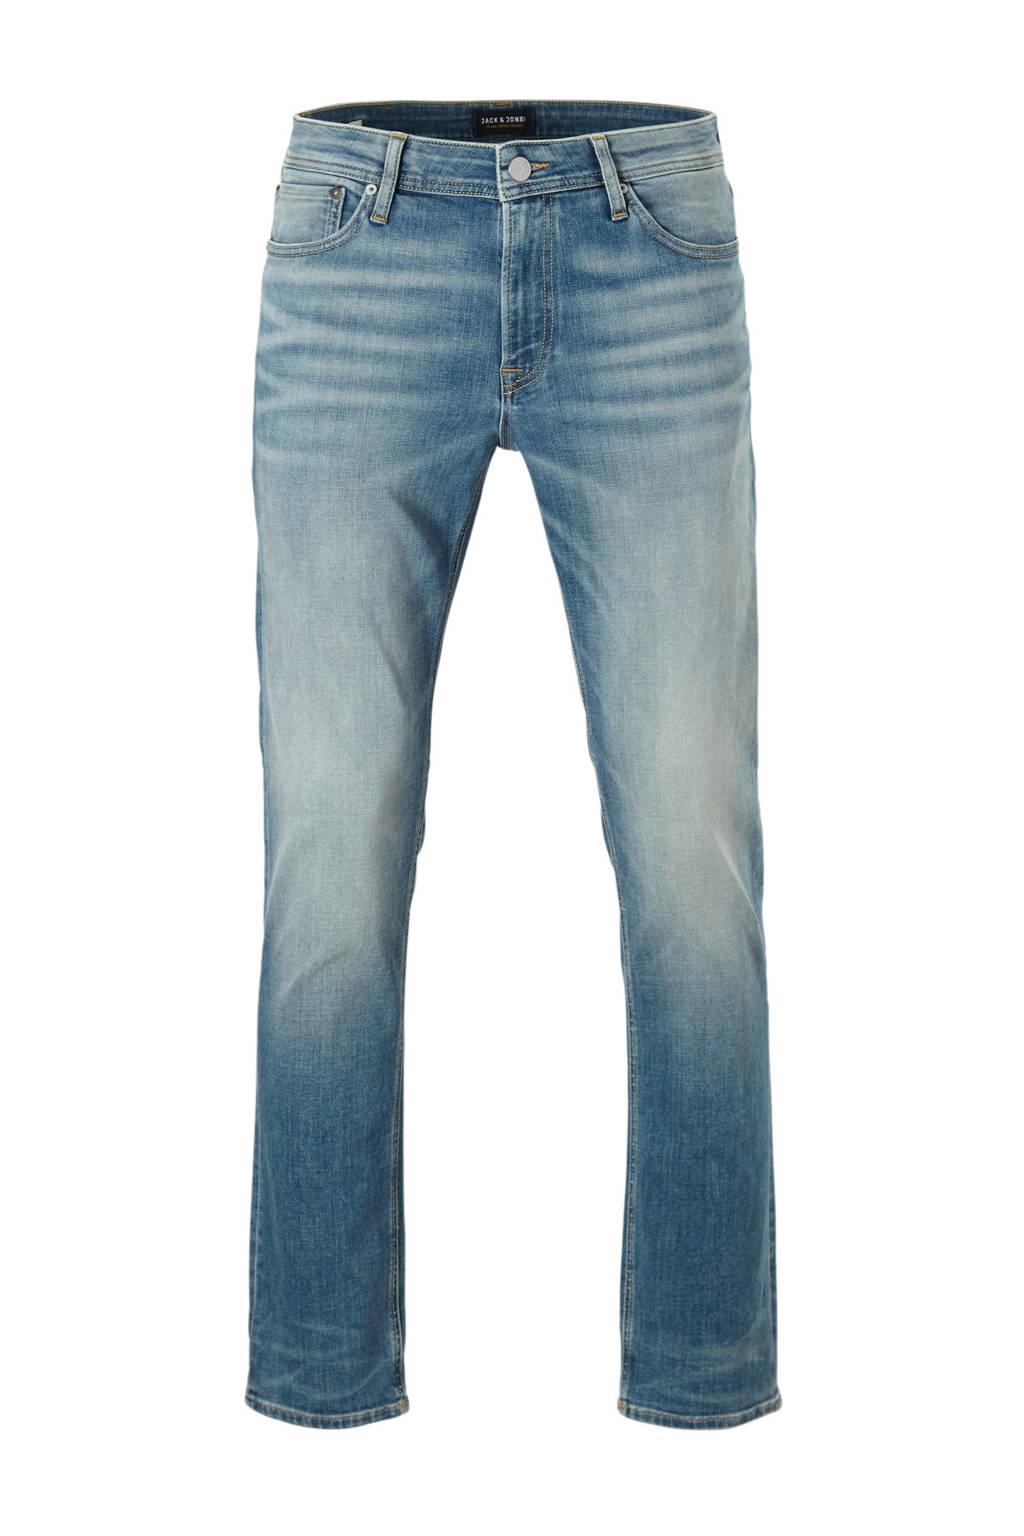 Jack & Jones Jeans Intelligence regular fit jeans Clark, Light denim